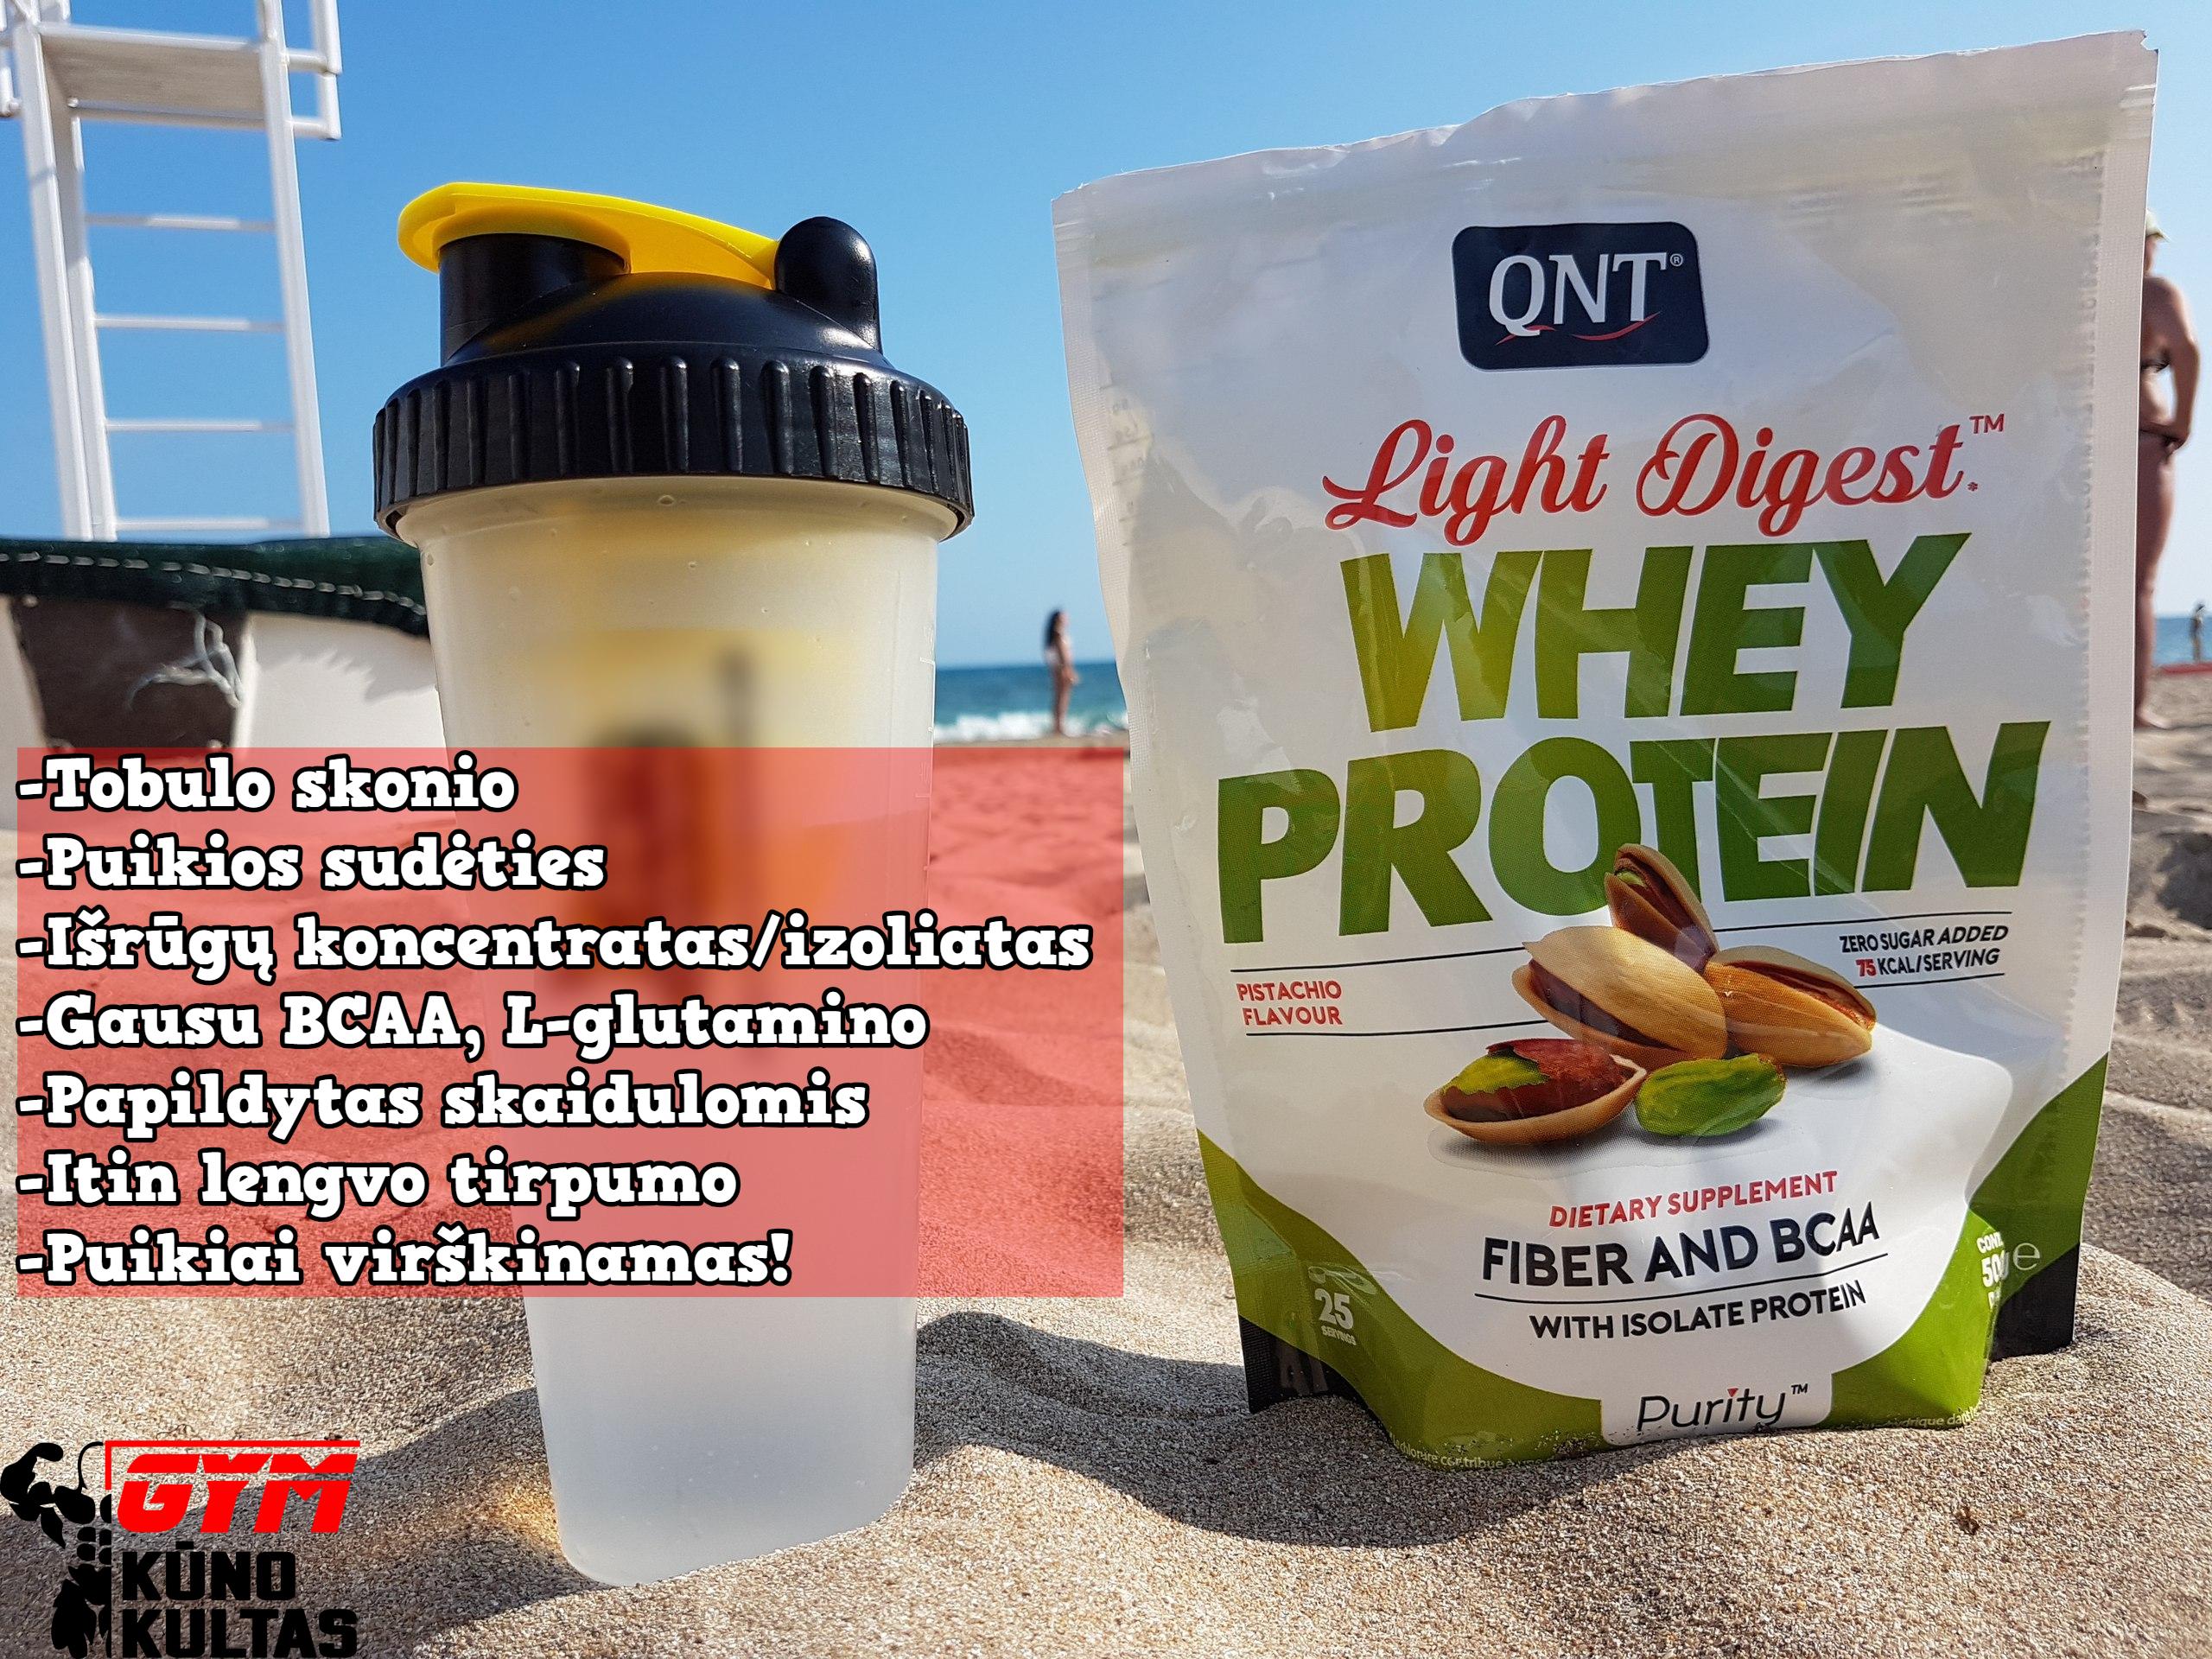 qnt light digest proteinas